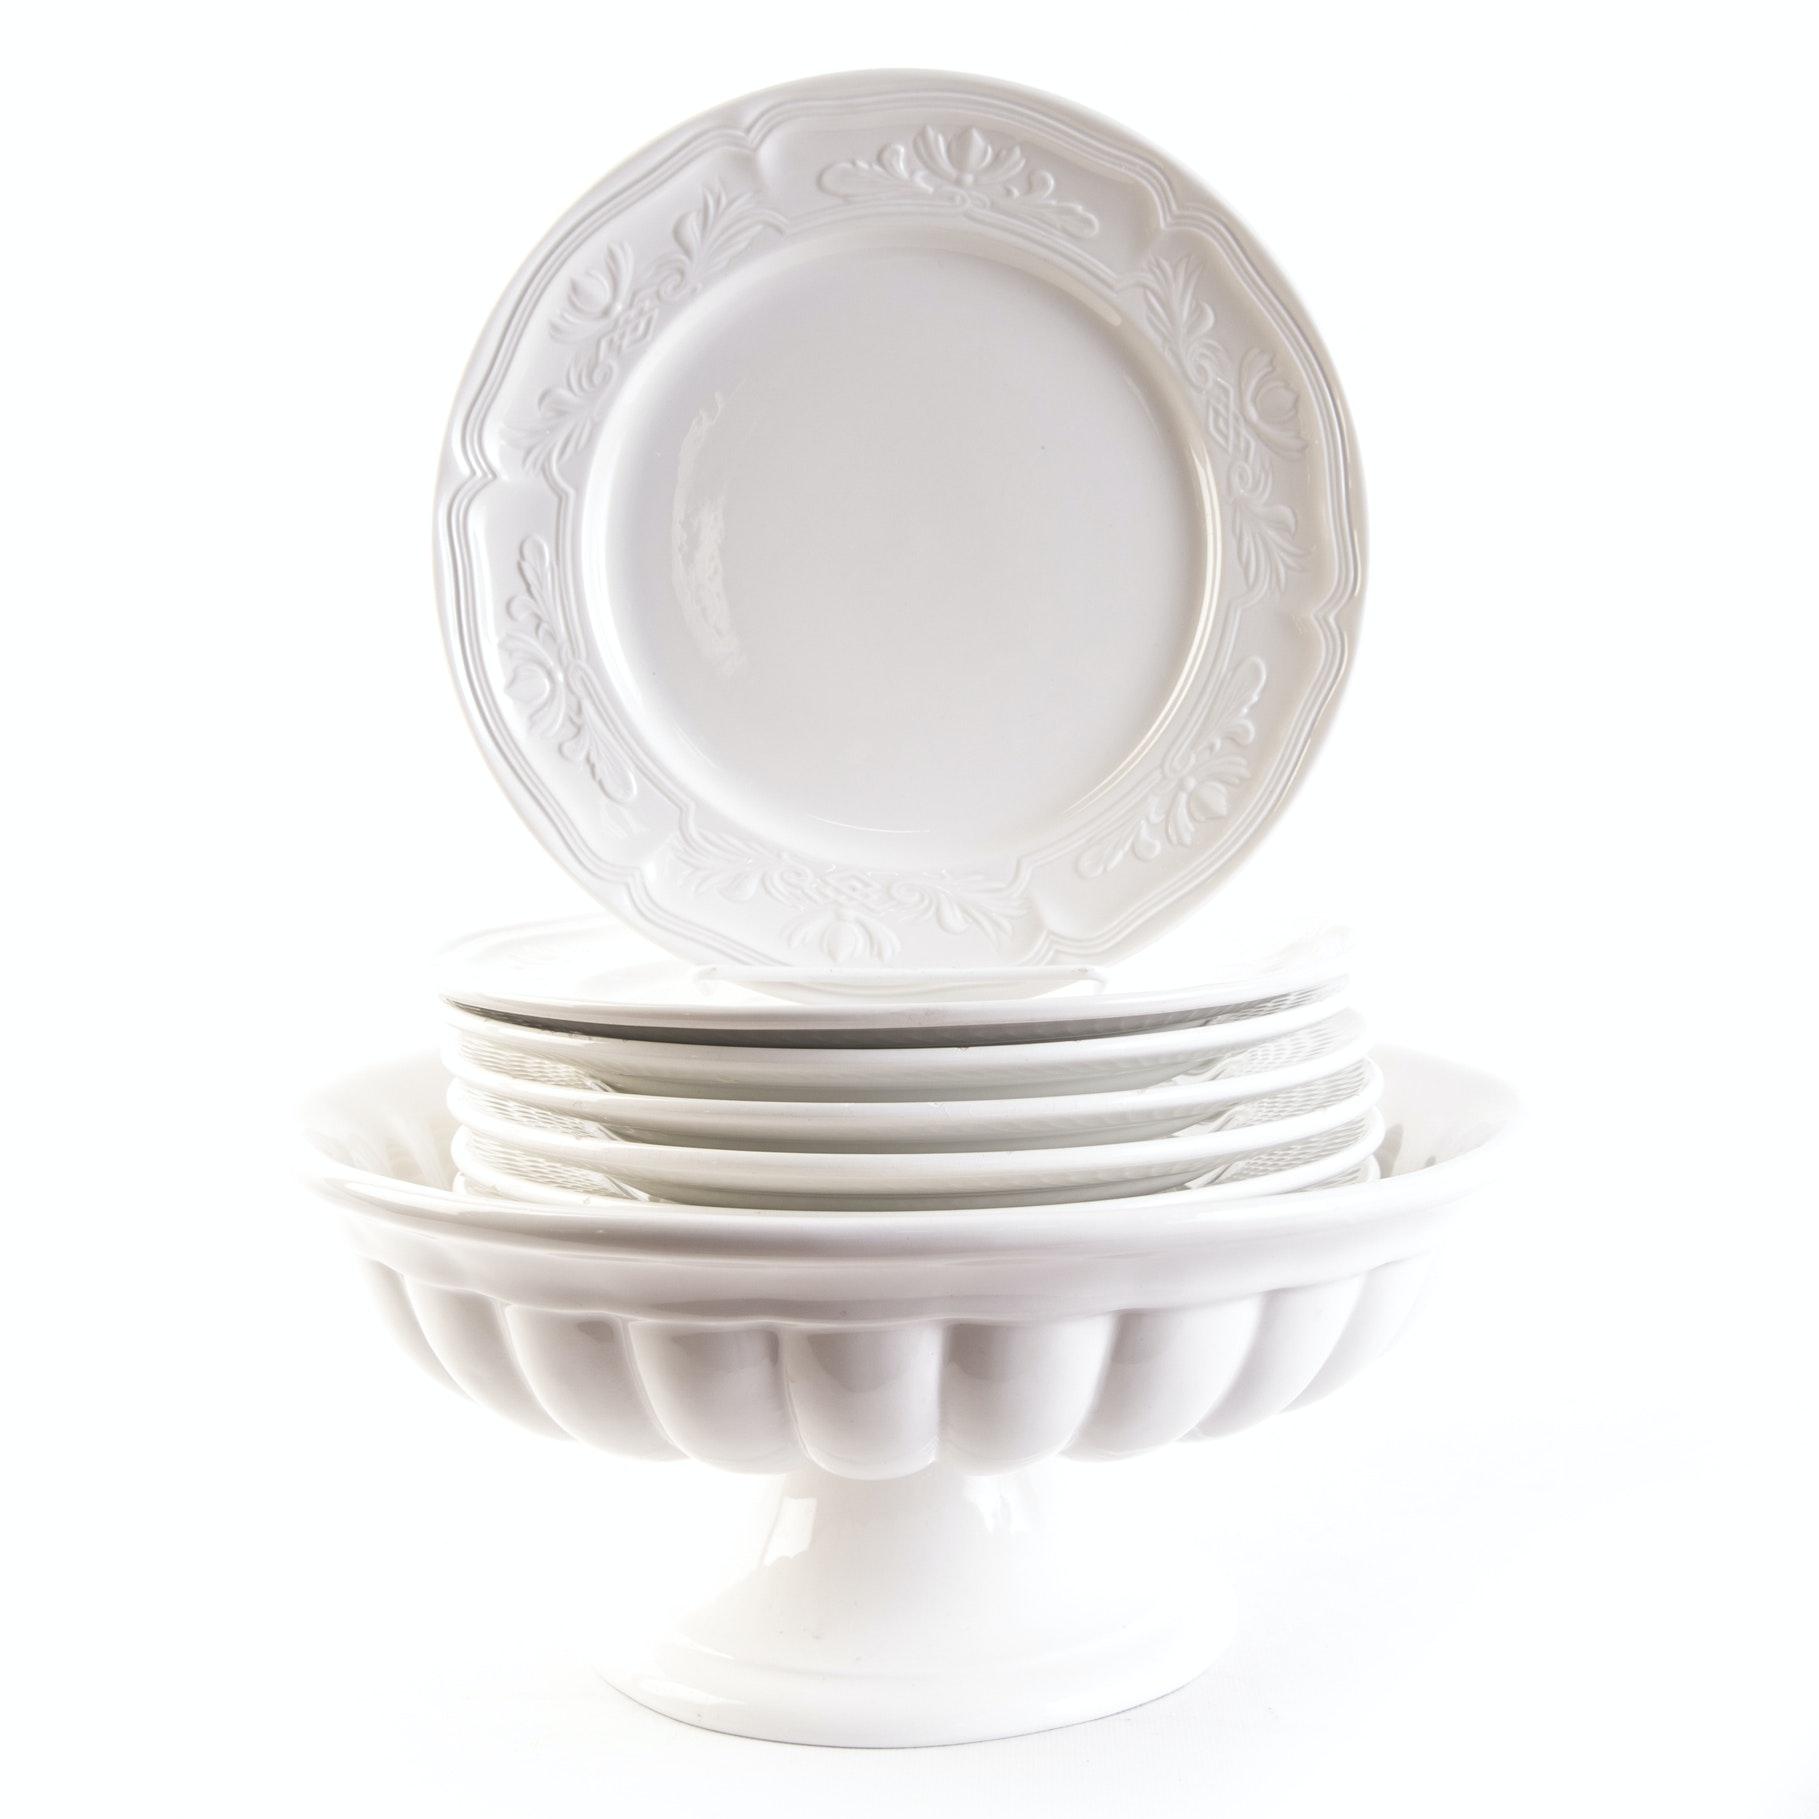 Tableware Featuring Villeroy & Boch